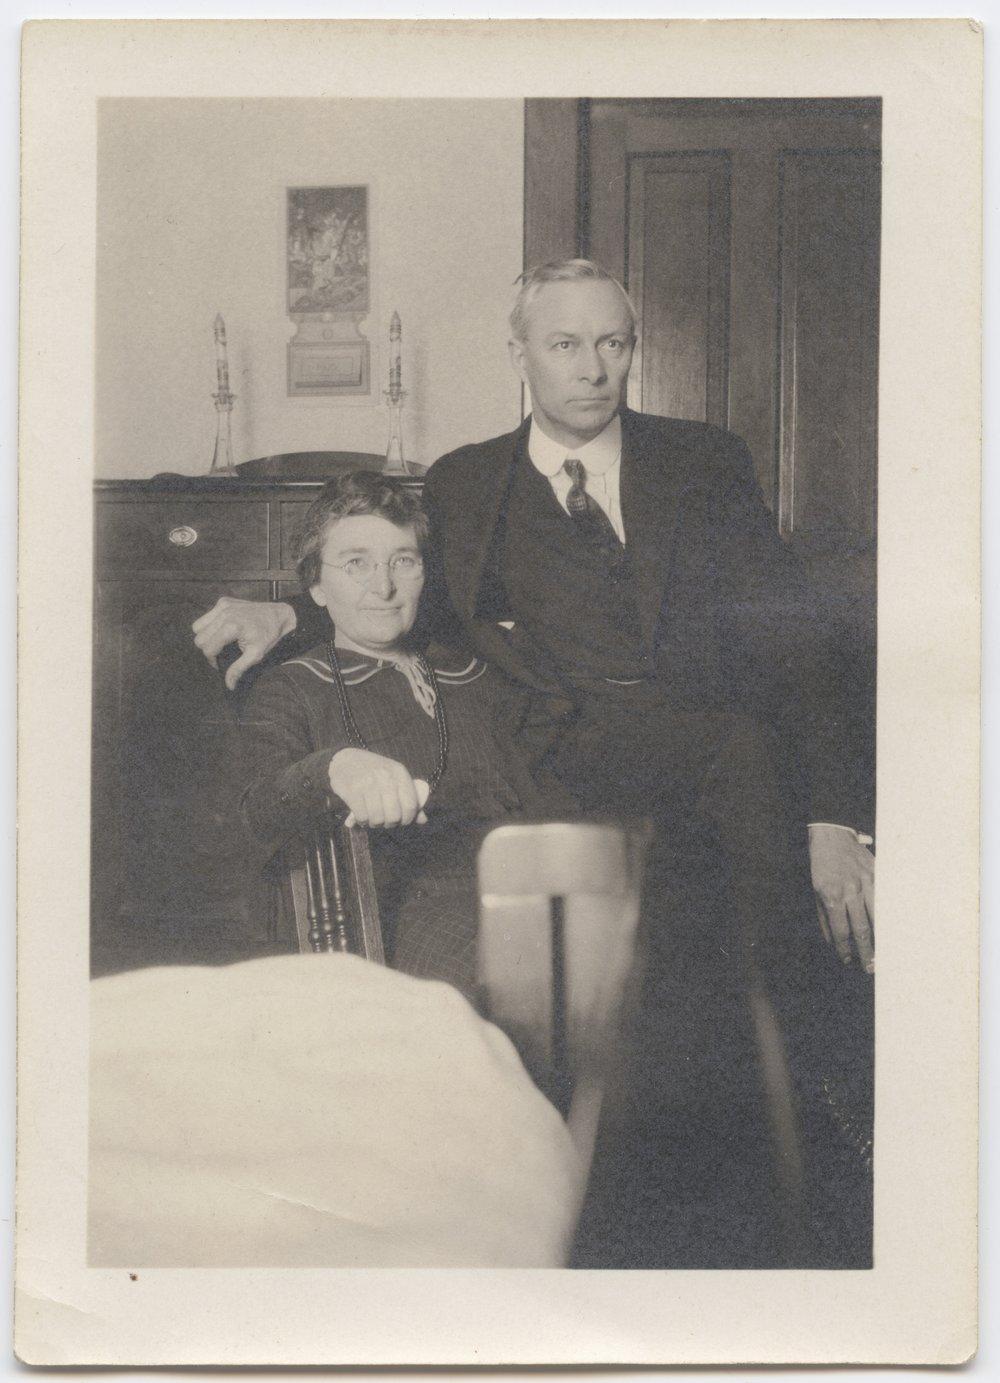 Charles A. and Lula Richard - 1